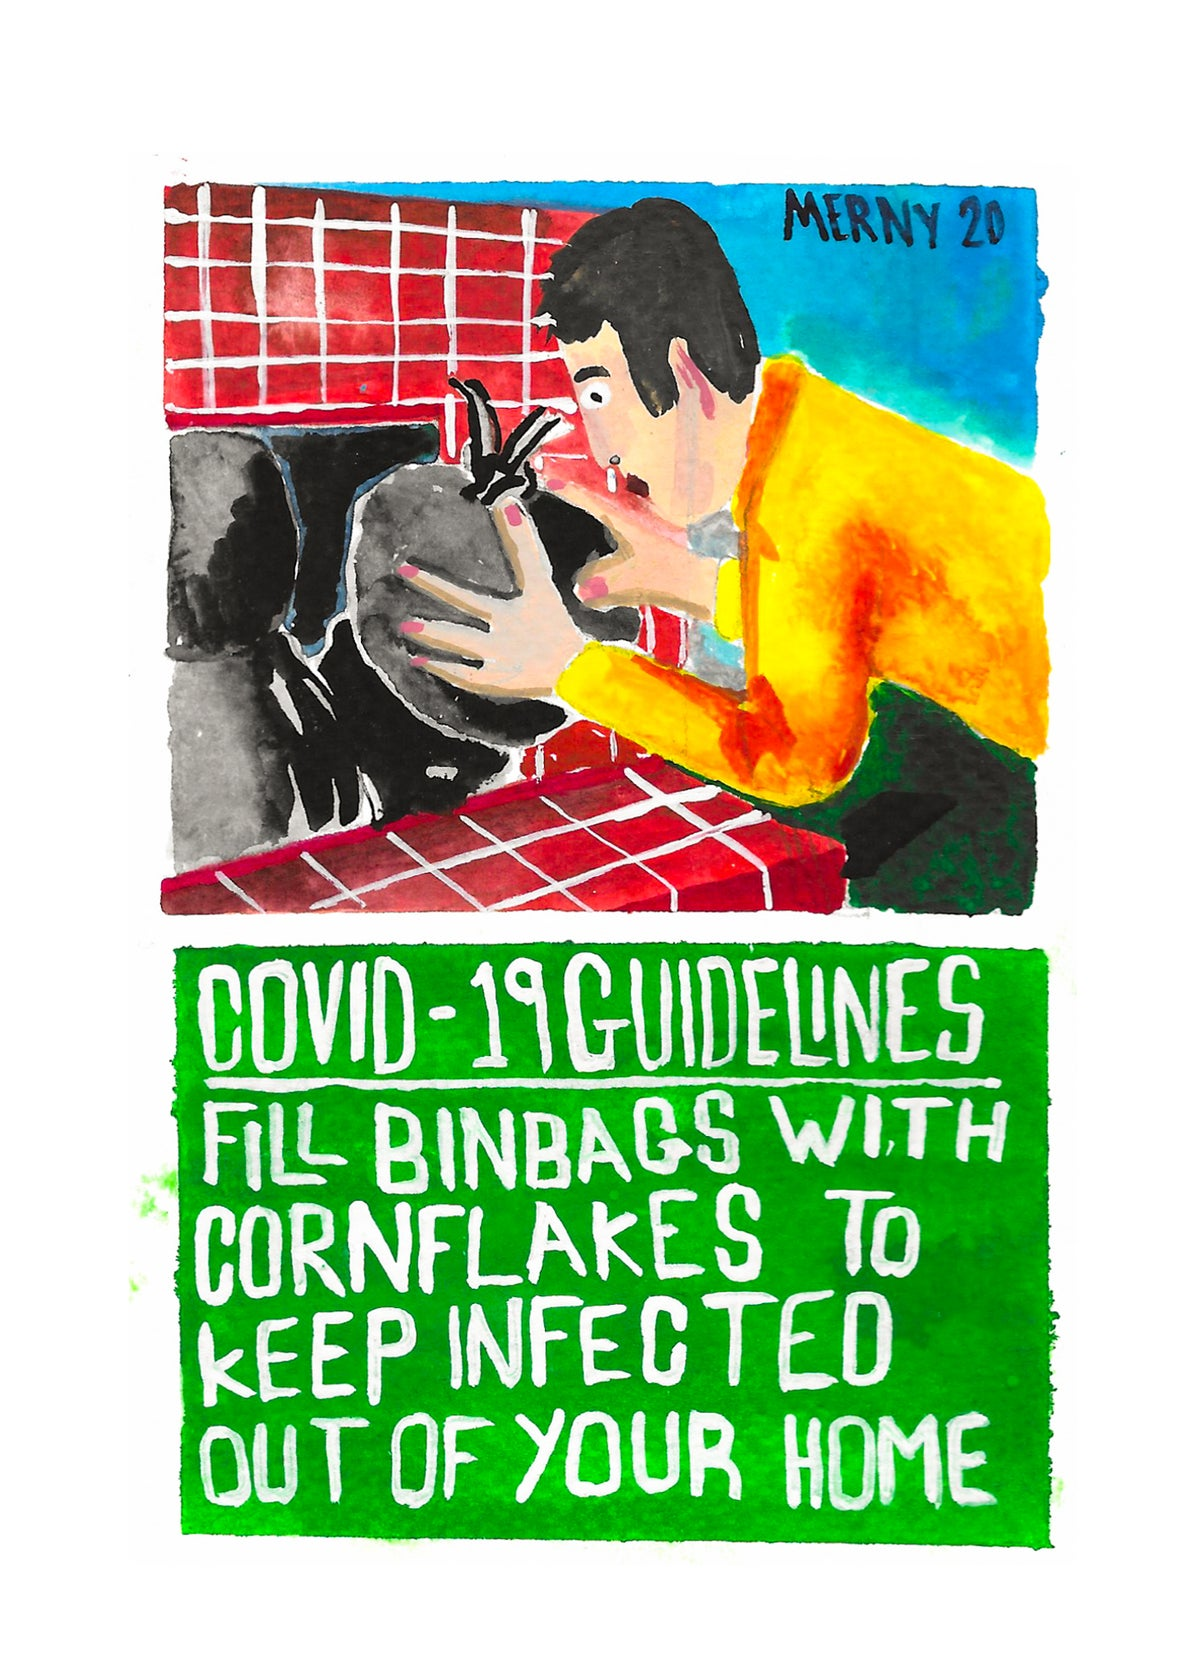 Covid Guidelines #1 Cornflake Binbags